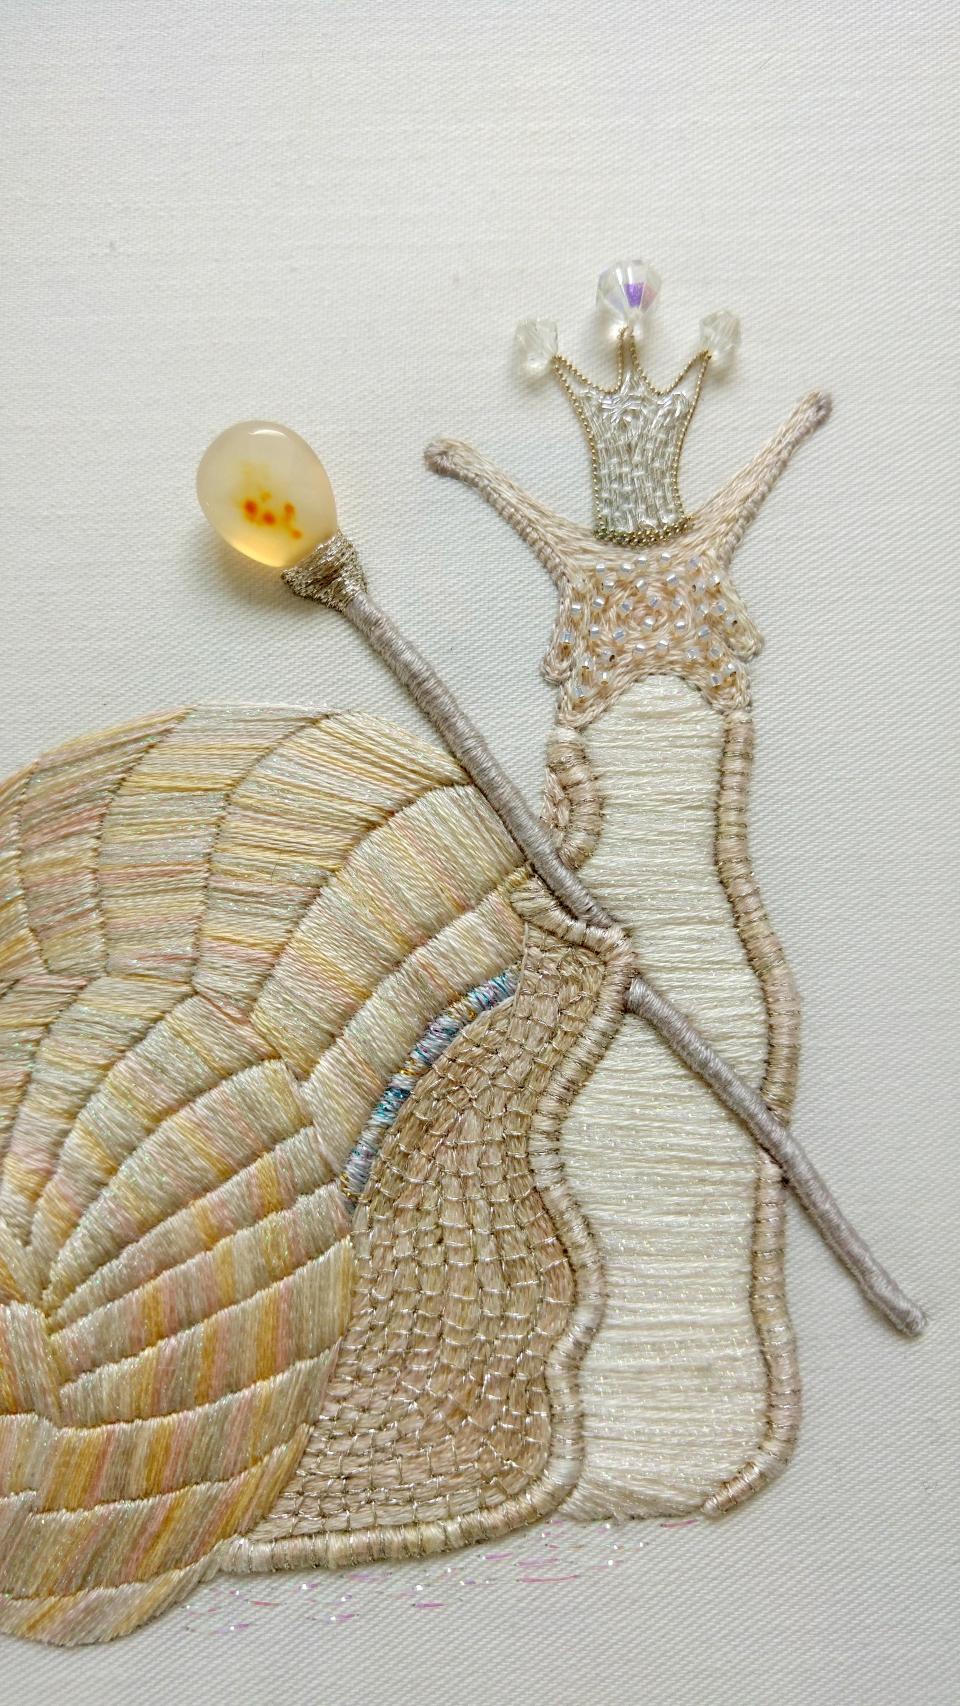 snailcomplete3